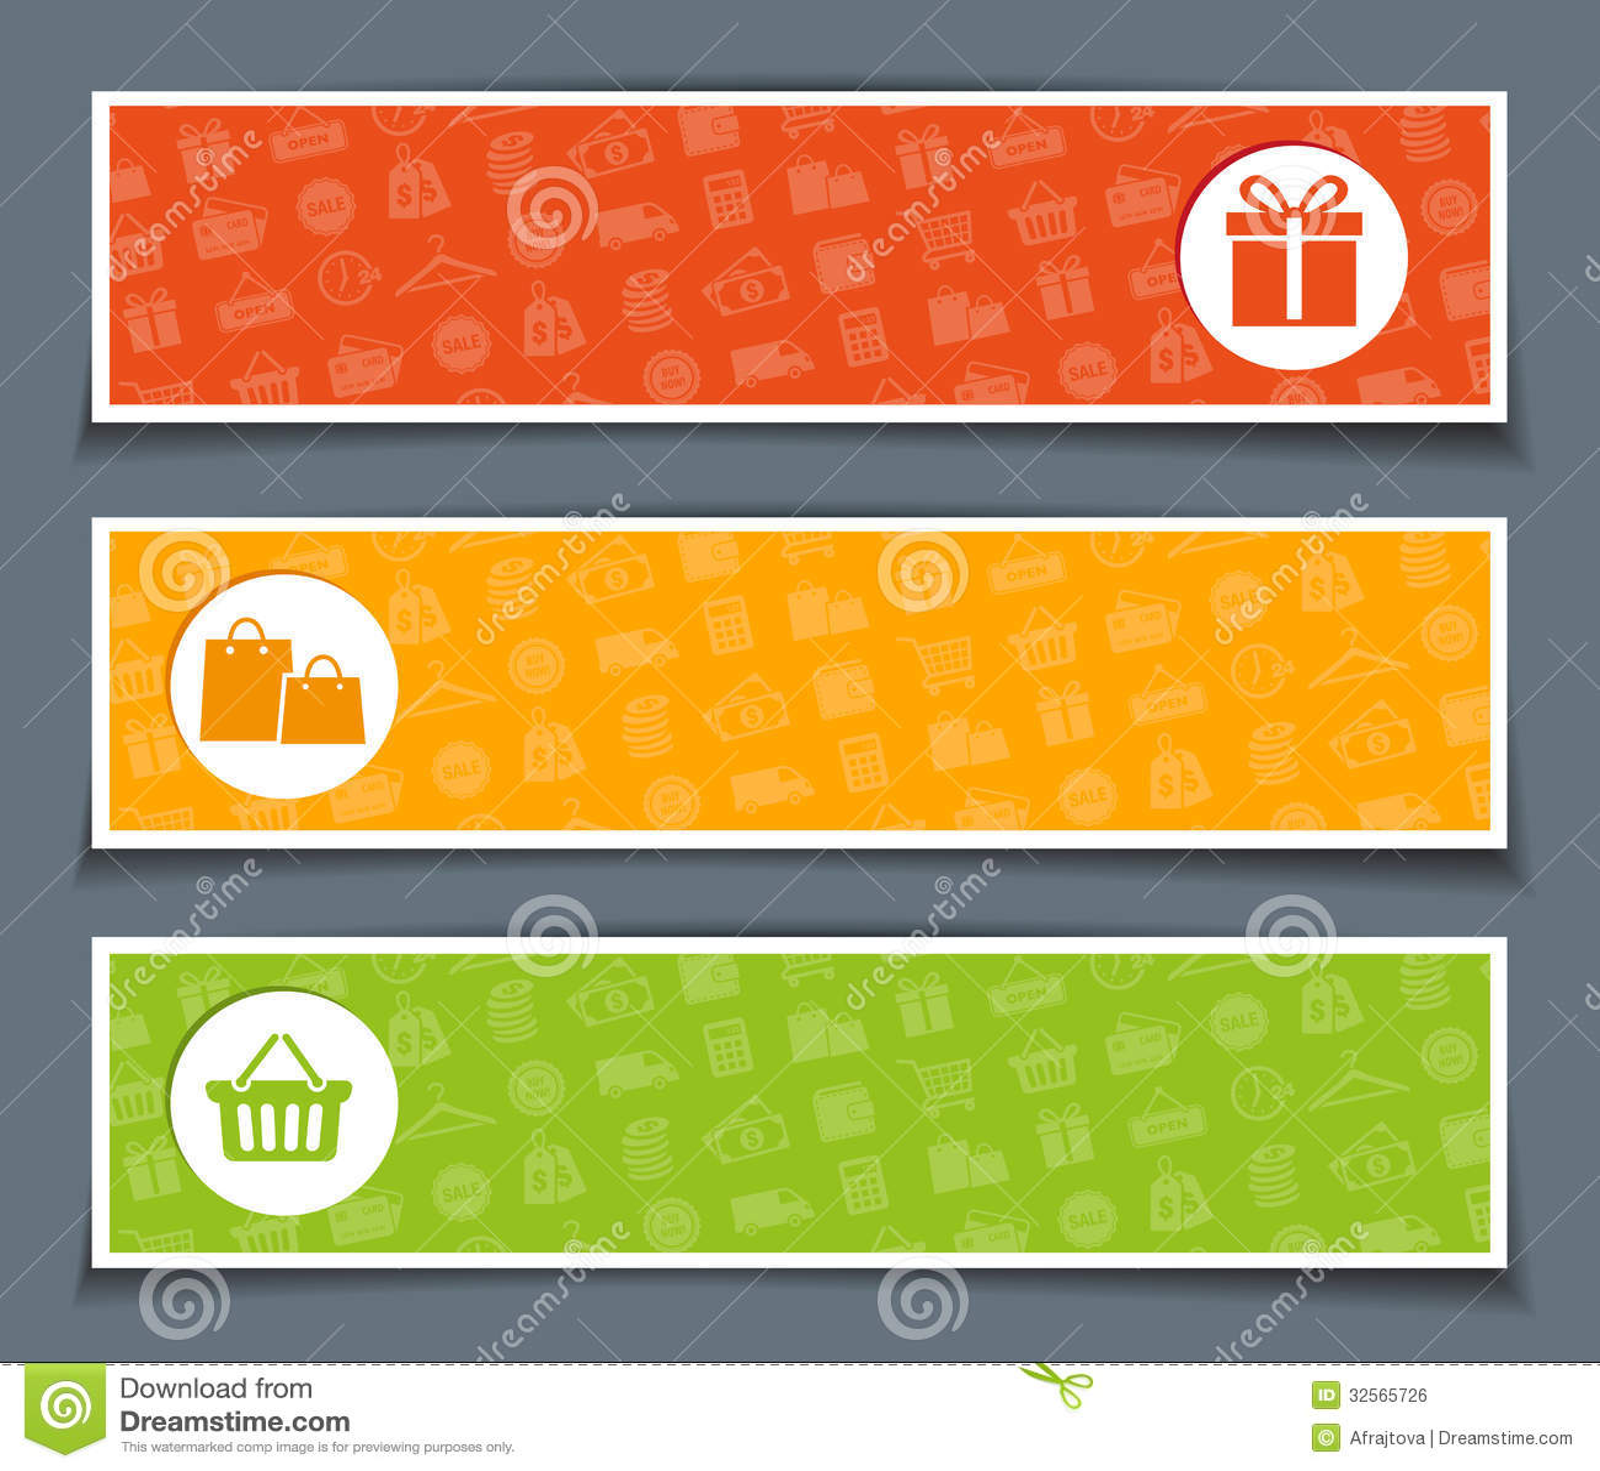 Three Super Sales Banners Stock Illustration - Image: 52996123